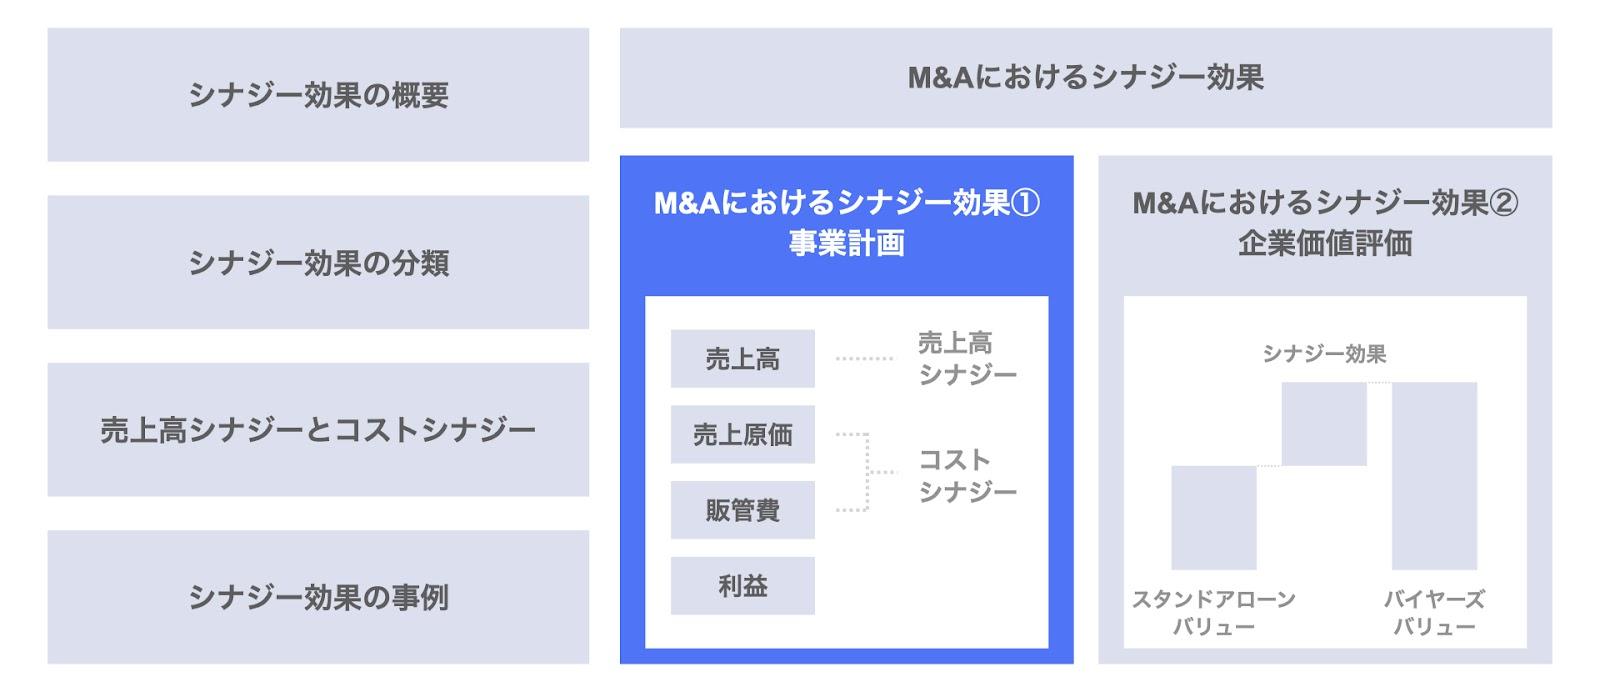 M&Aにおけるシナジー効果① 事業計画